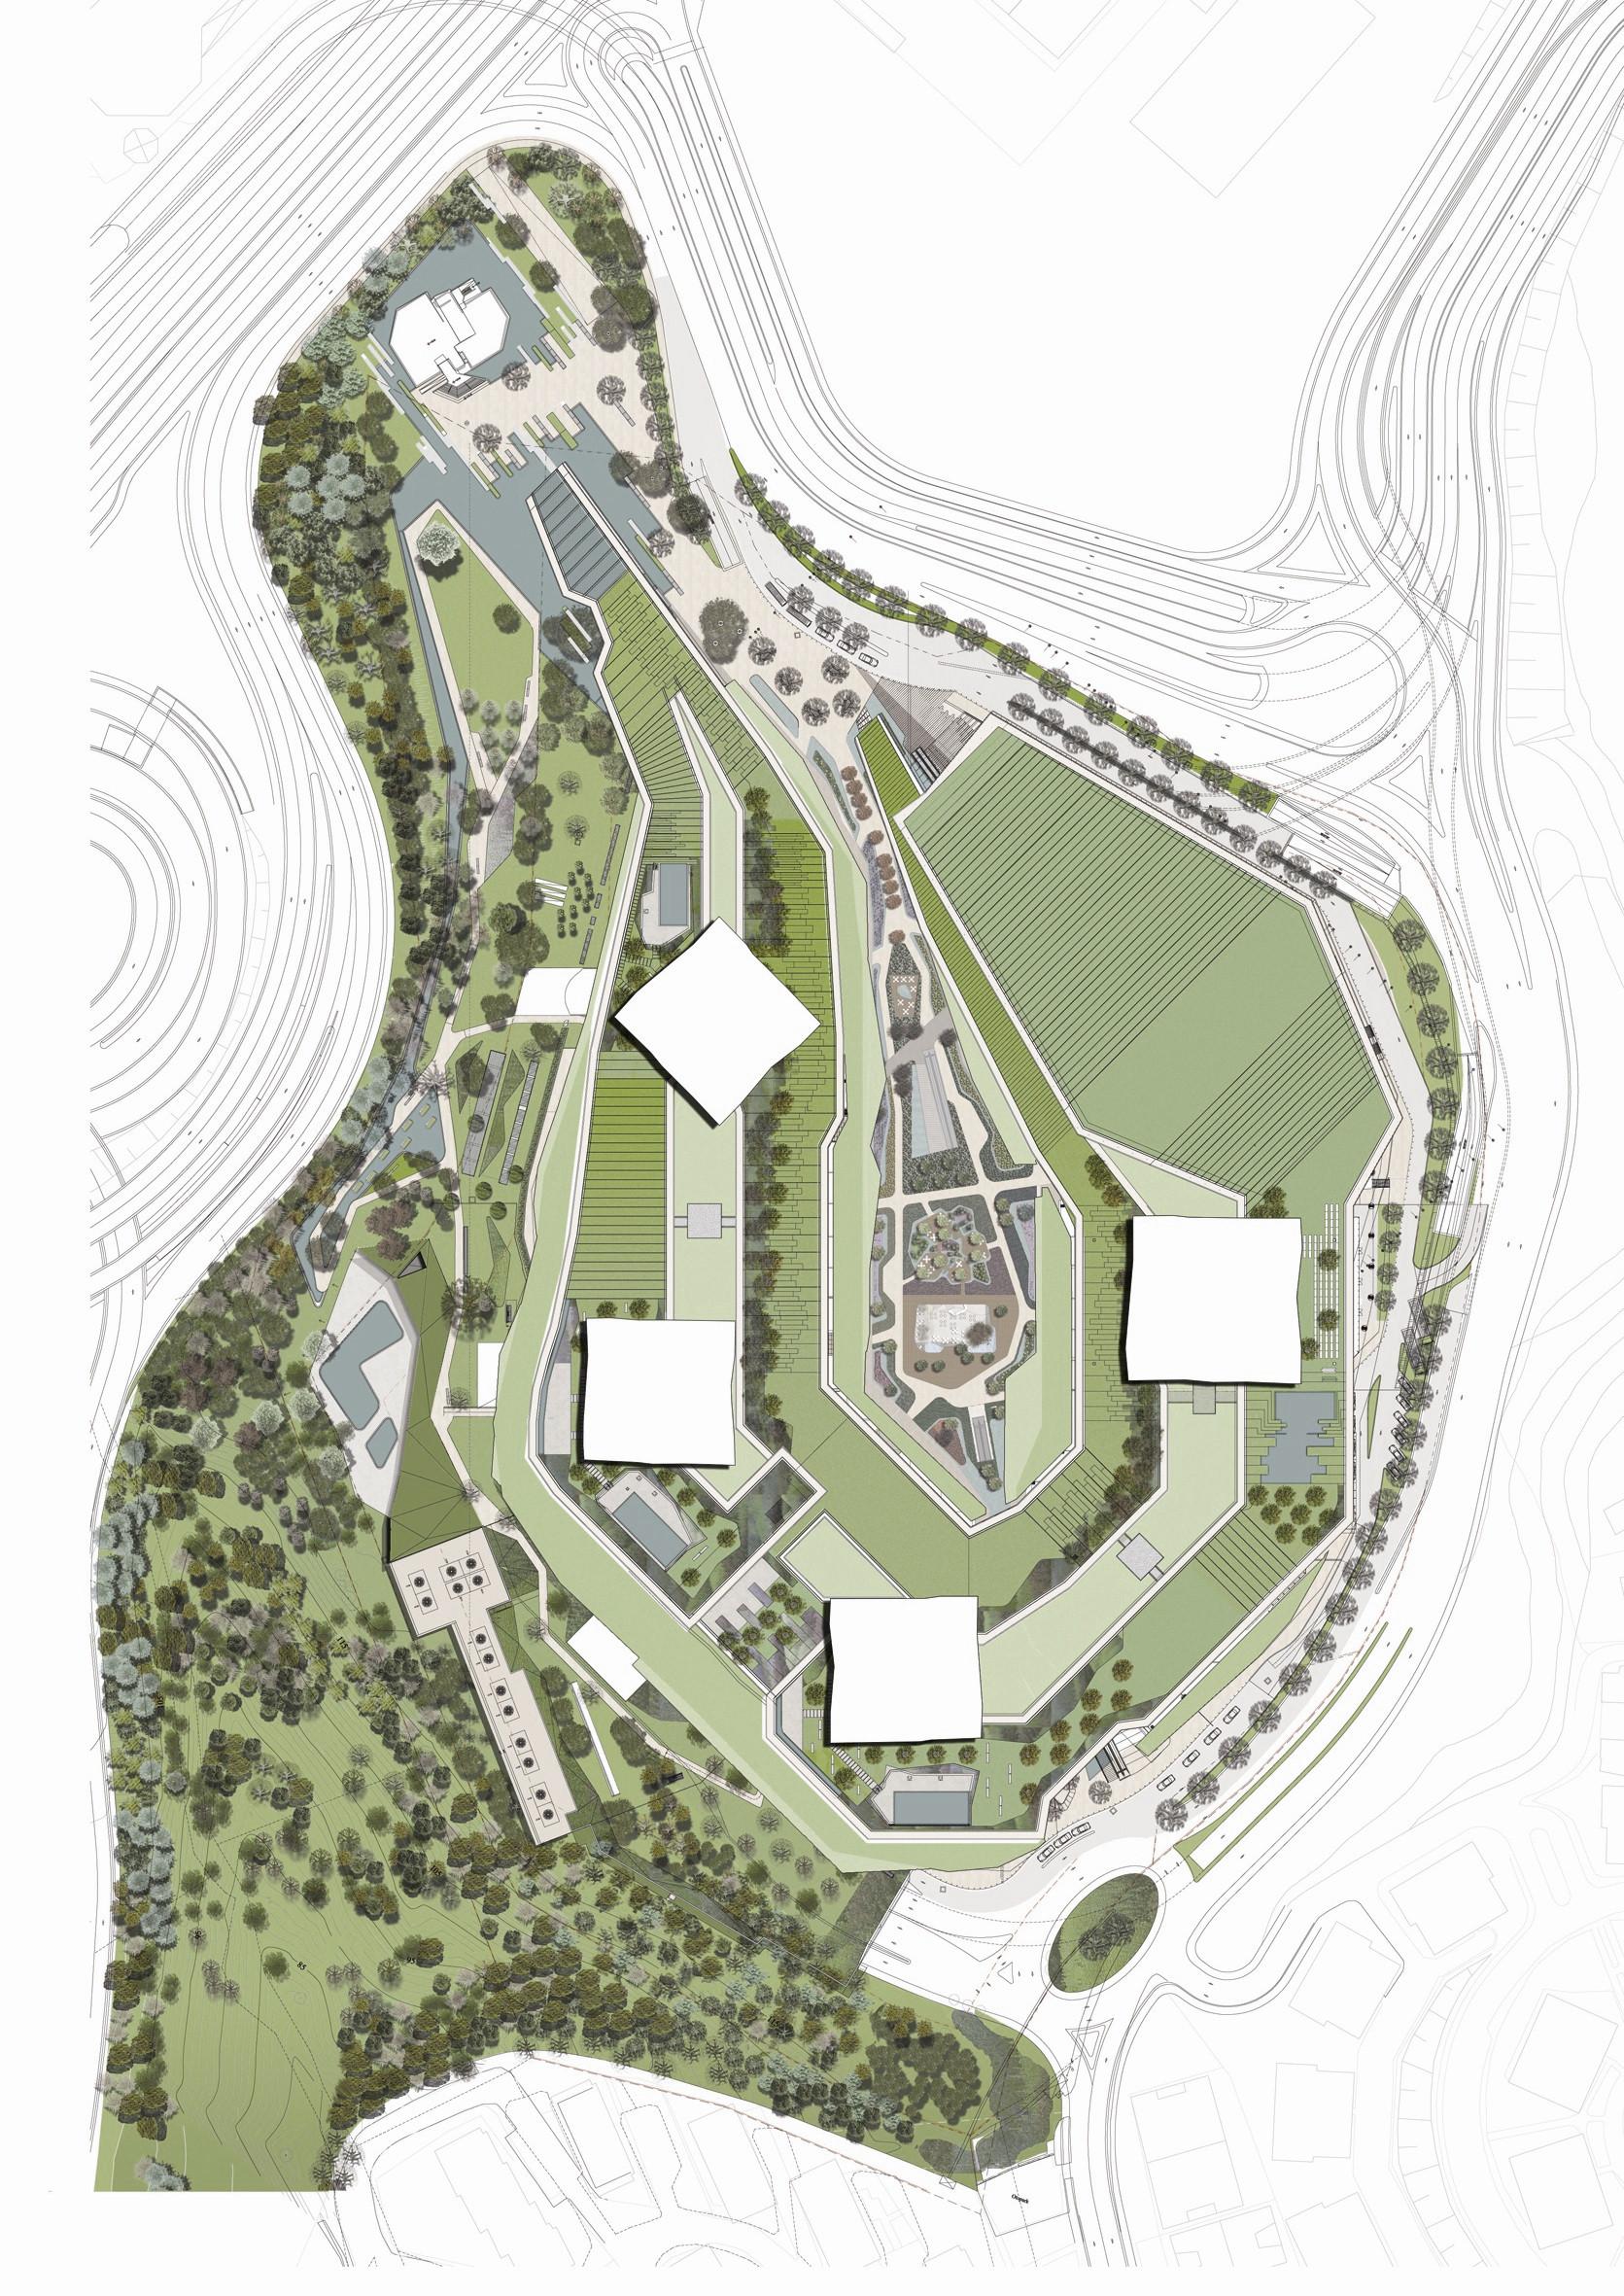 Gallery of zorlu center emre arolat architects for Architecture design websites free